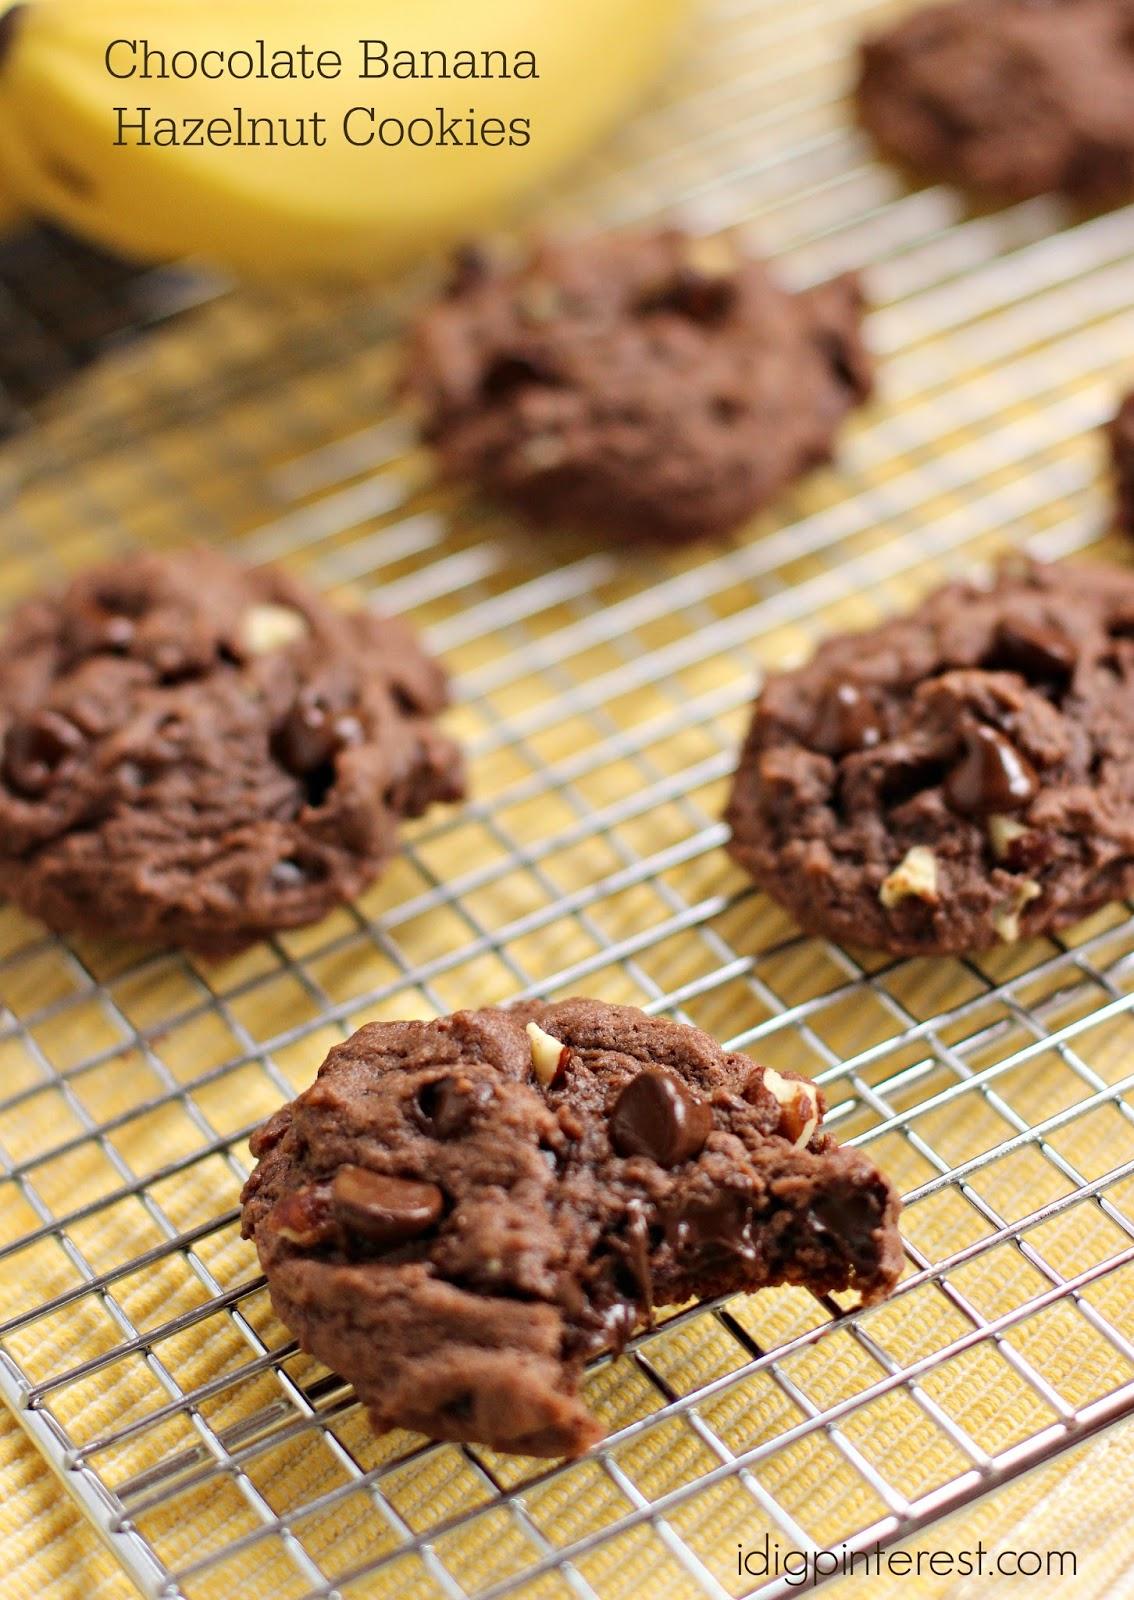 Chocolate Banana Hazelnut Cookies - I Dig Pinterest